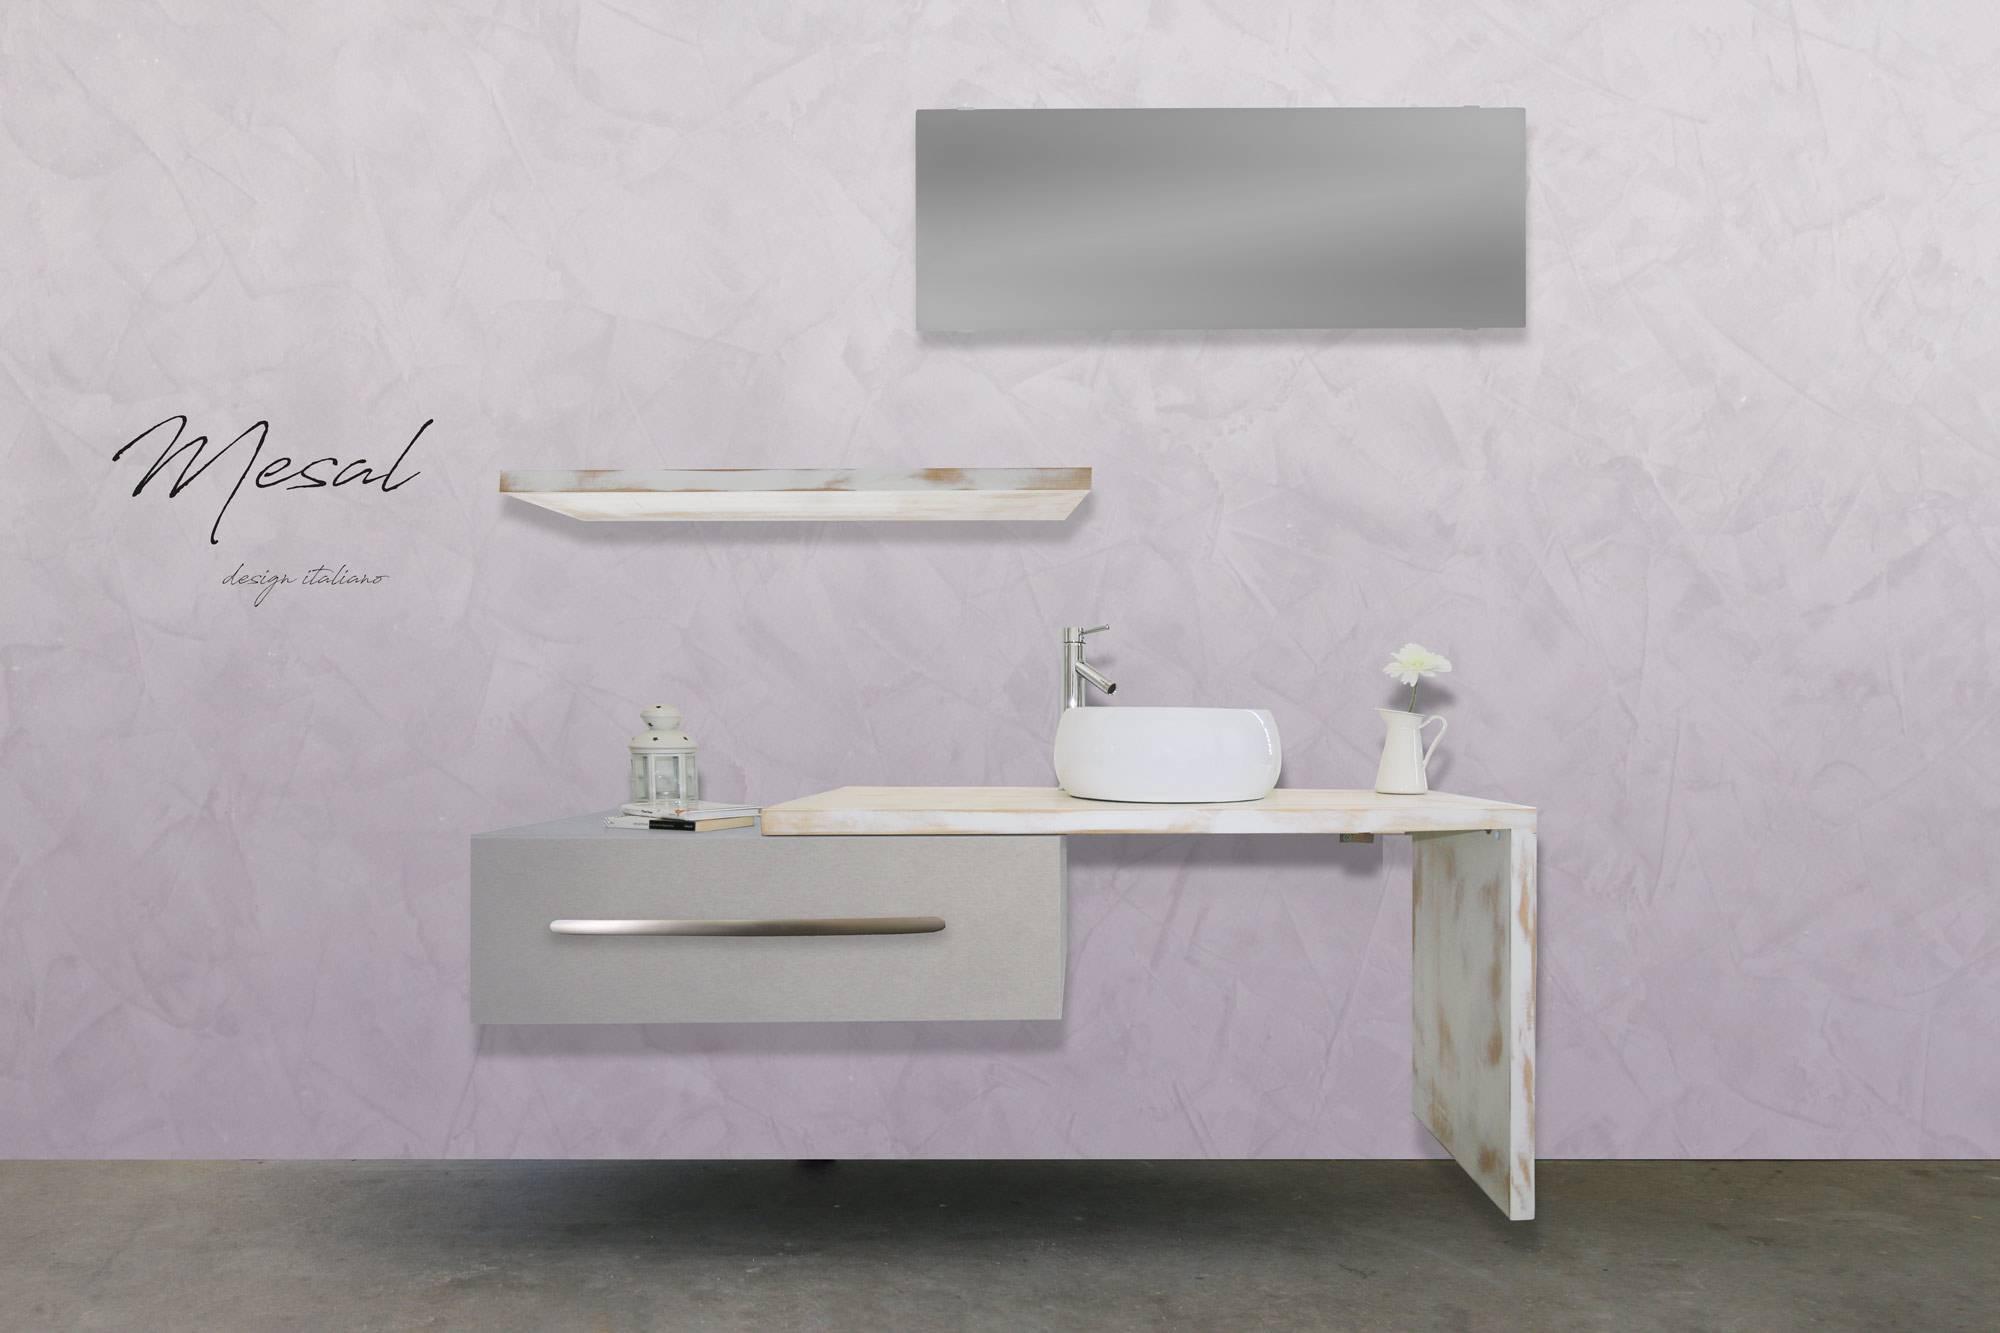 Mobili da bagno i materiali mesal falegnameria mobili - Mobile bagno joy ...